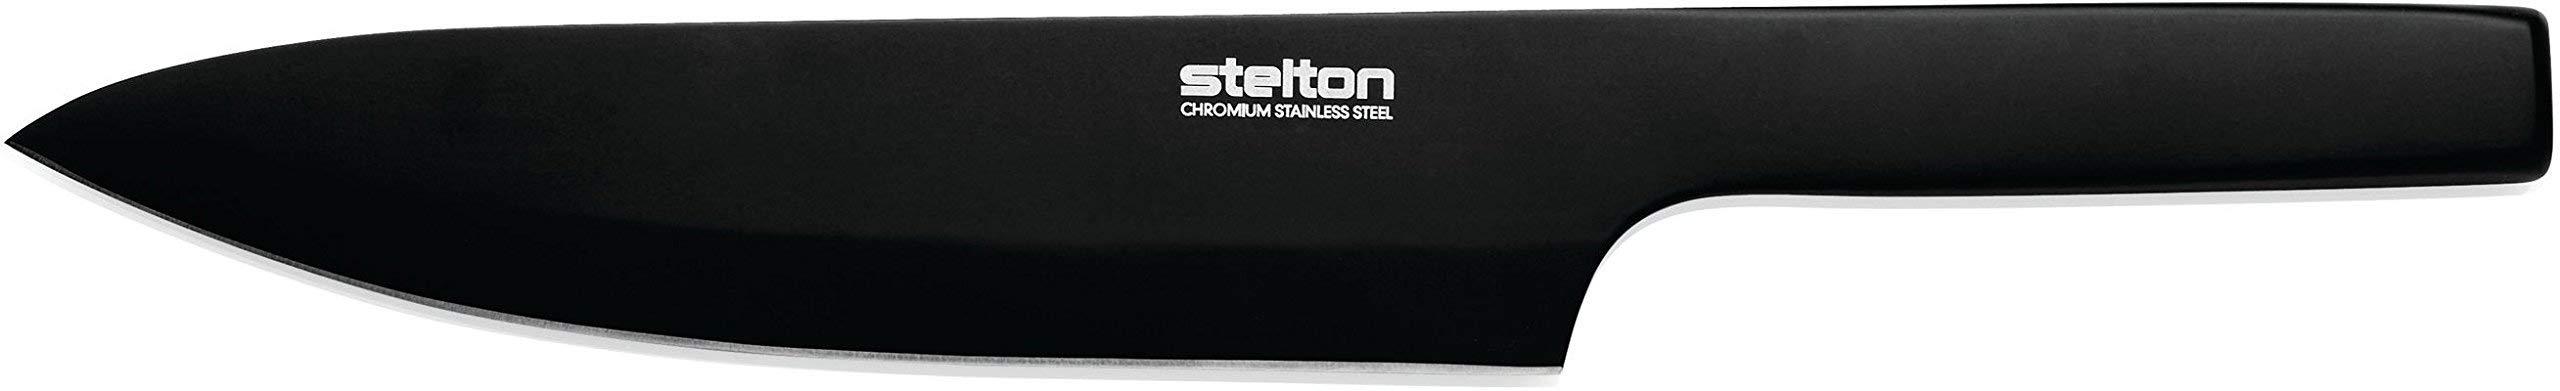 Stelton Pure Santoku Knife, Black